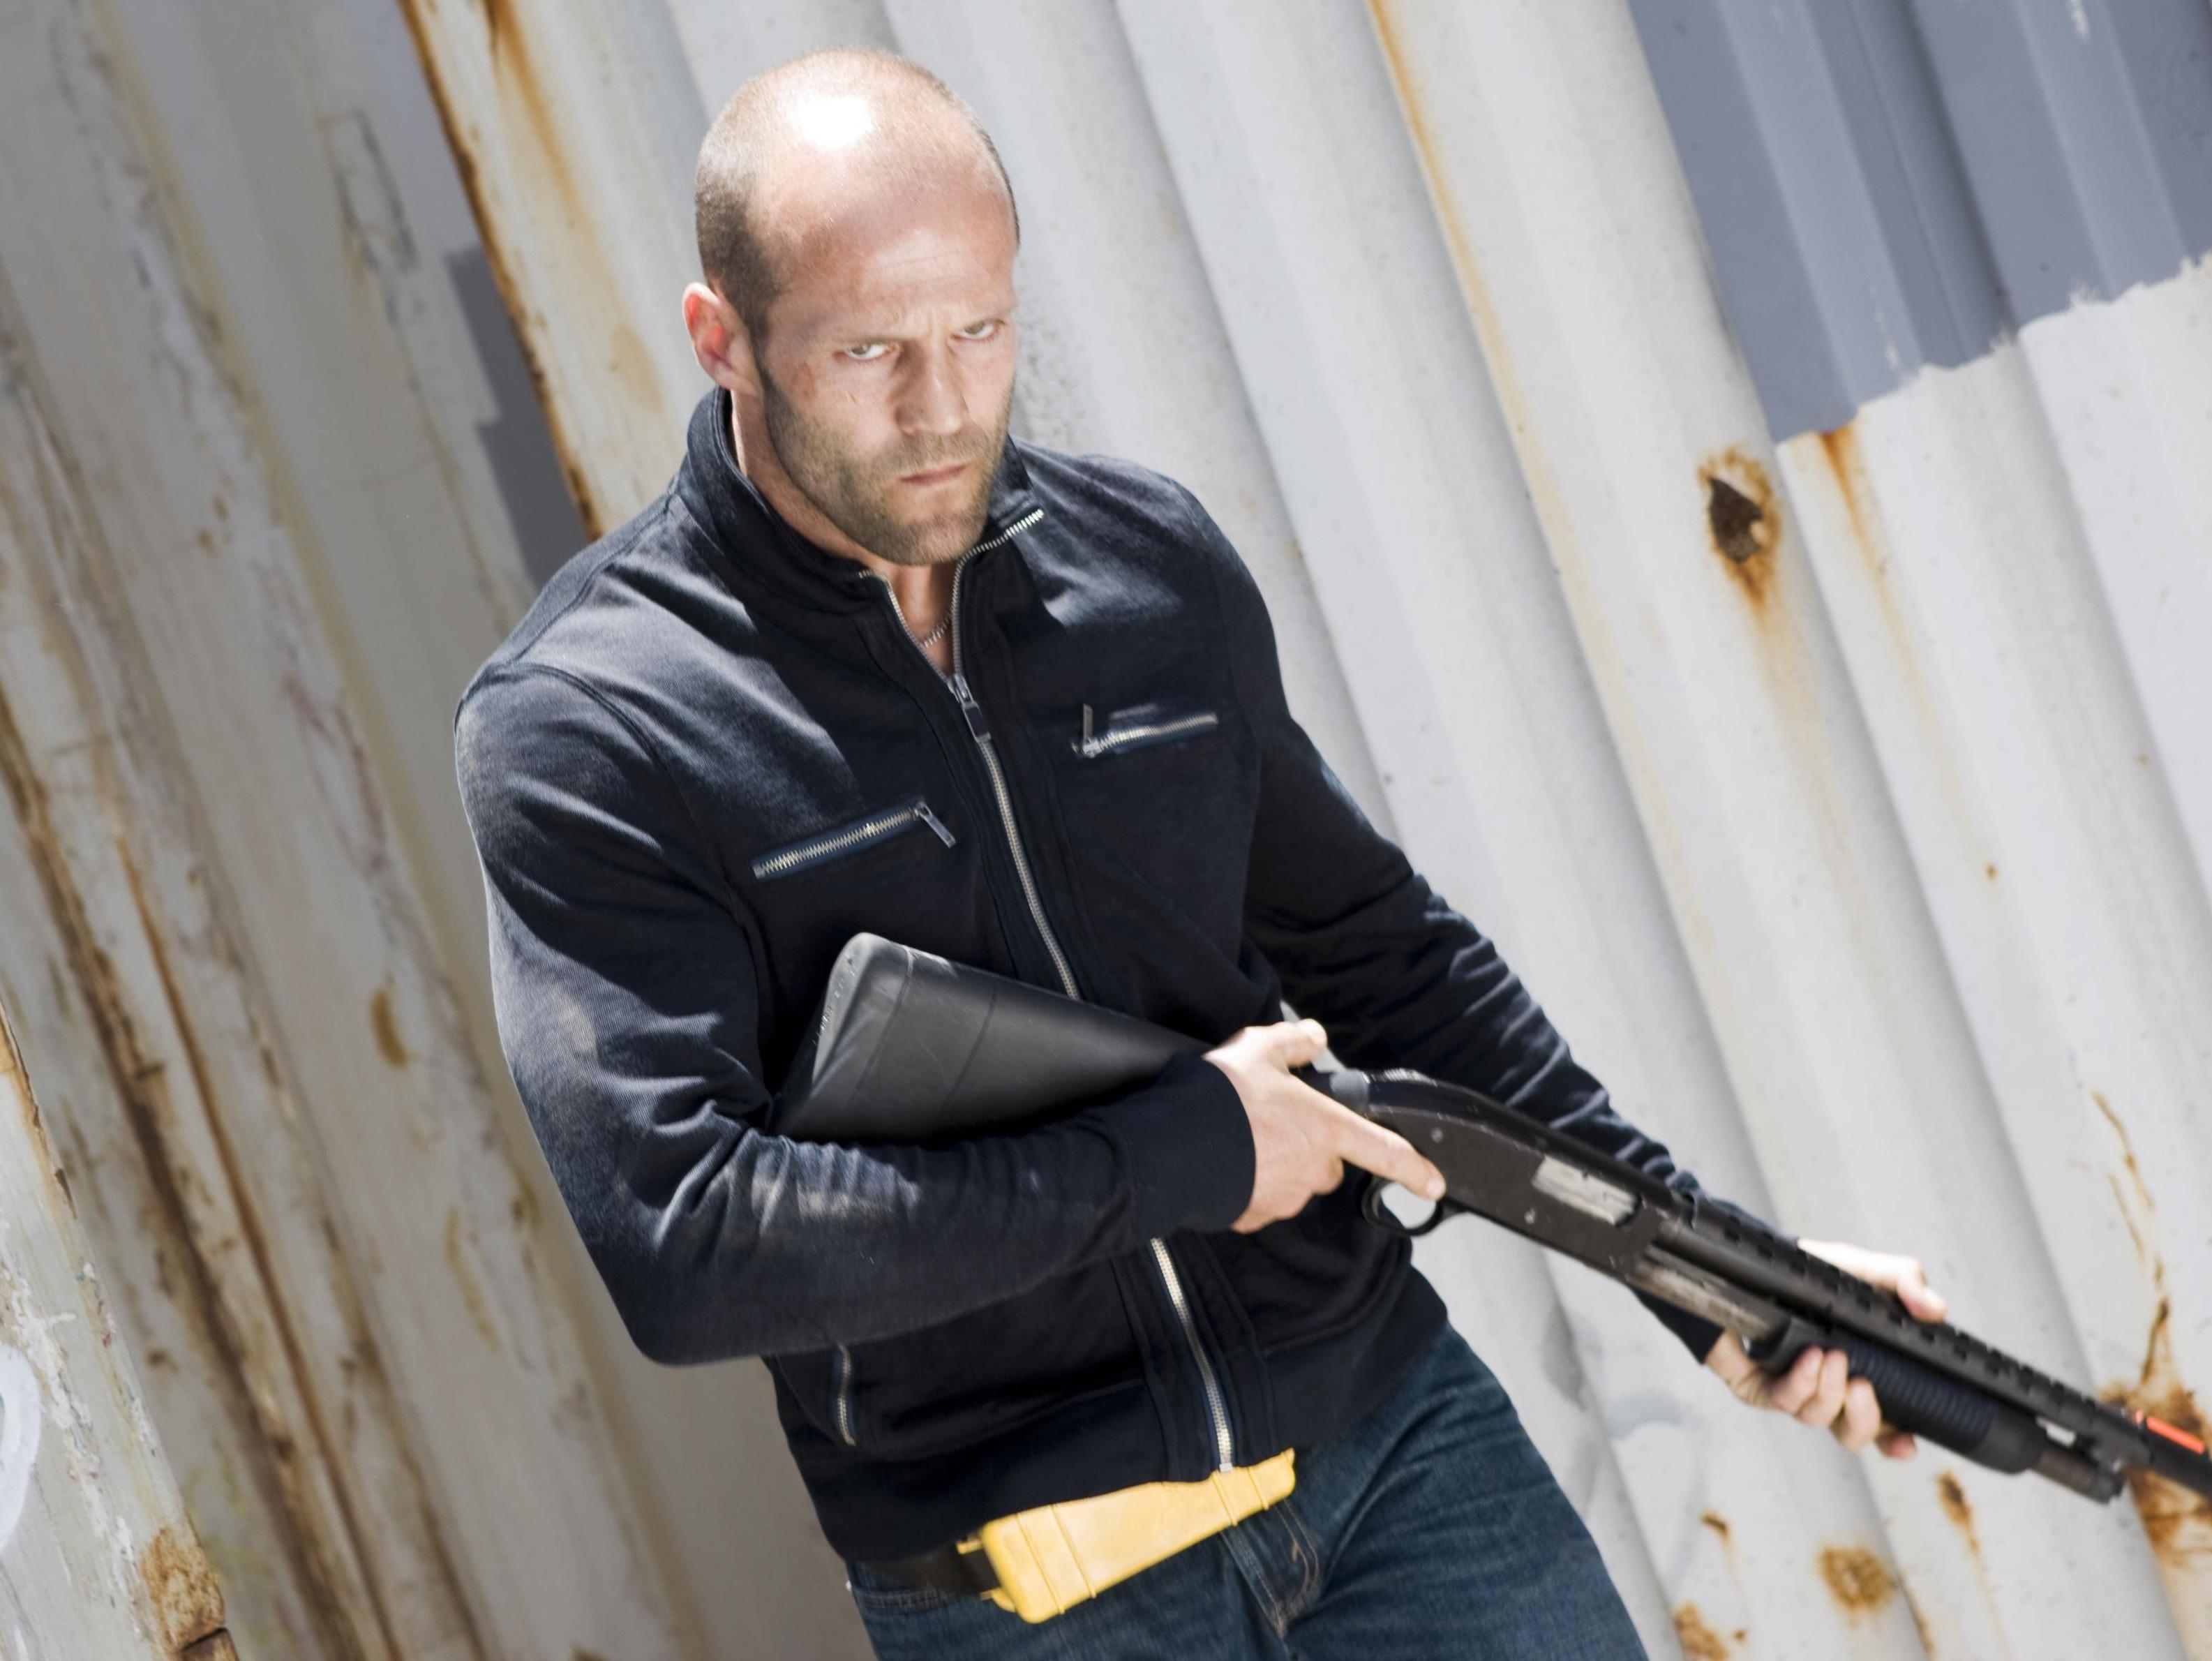 Jason Statham: The Last Action Hero